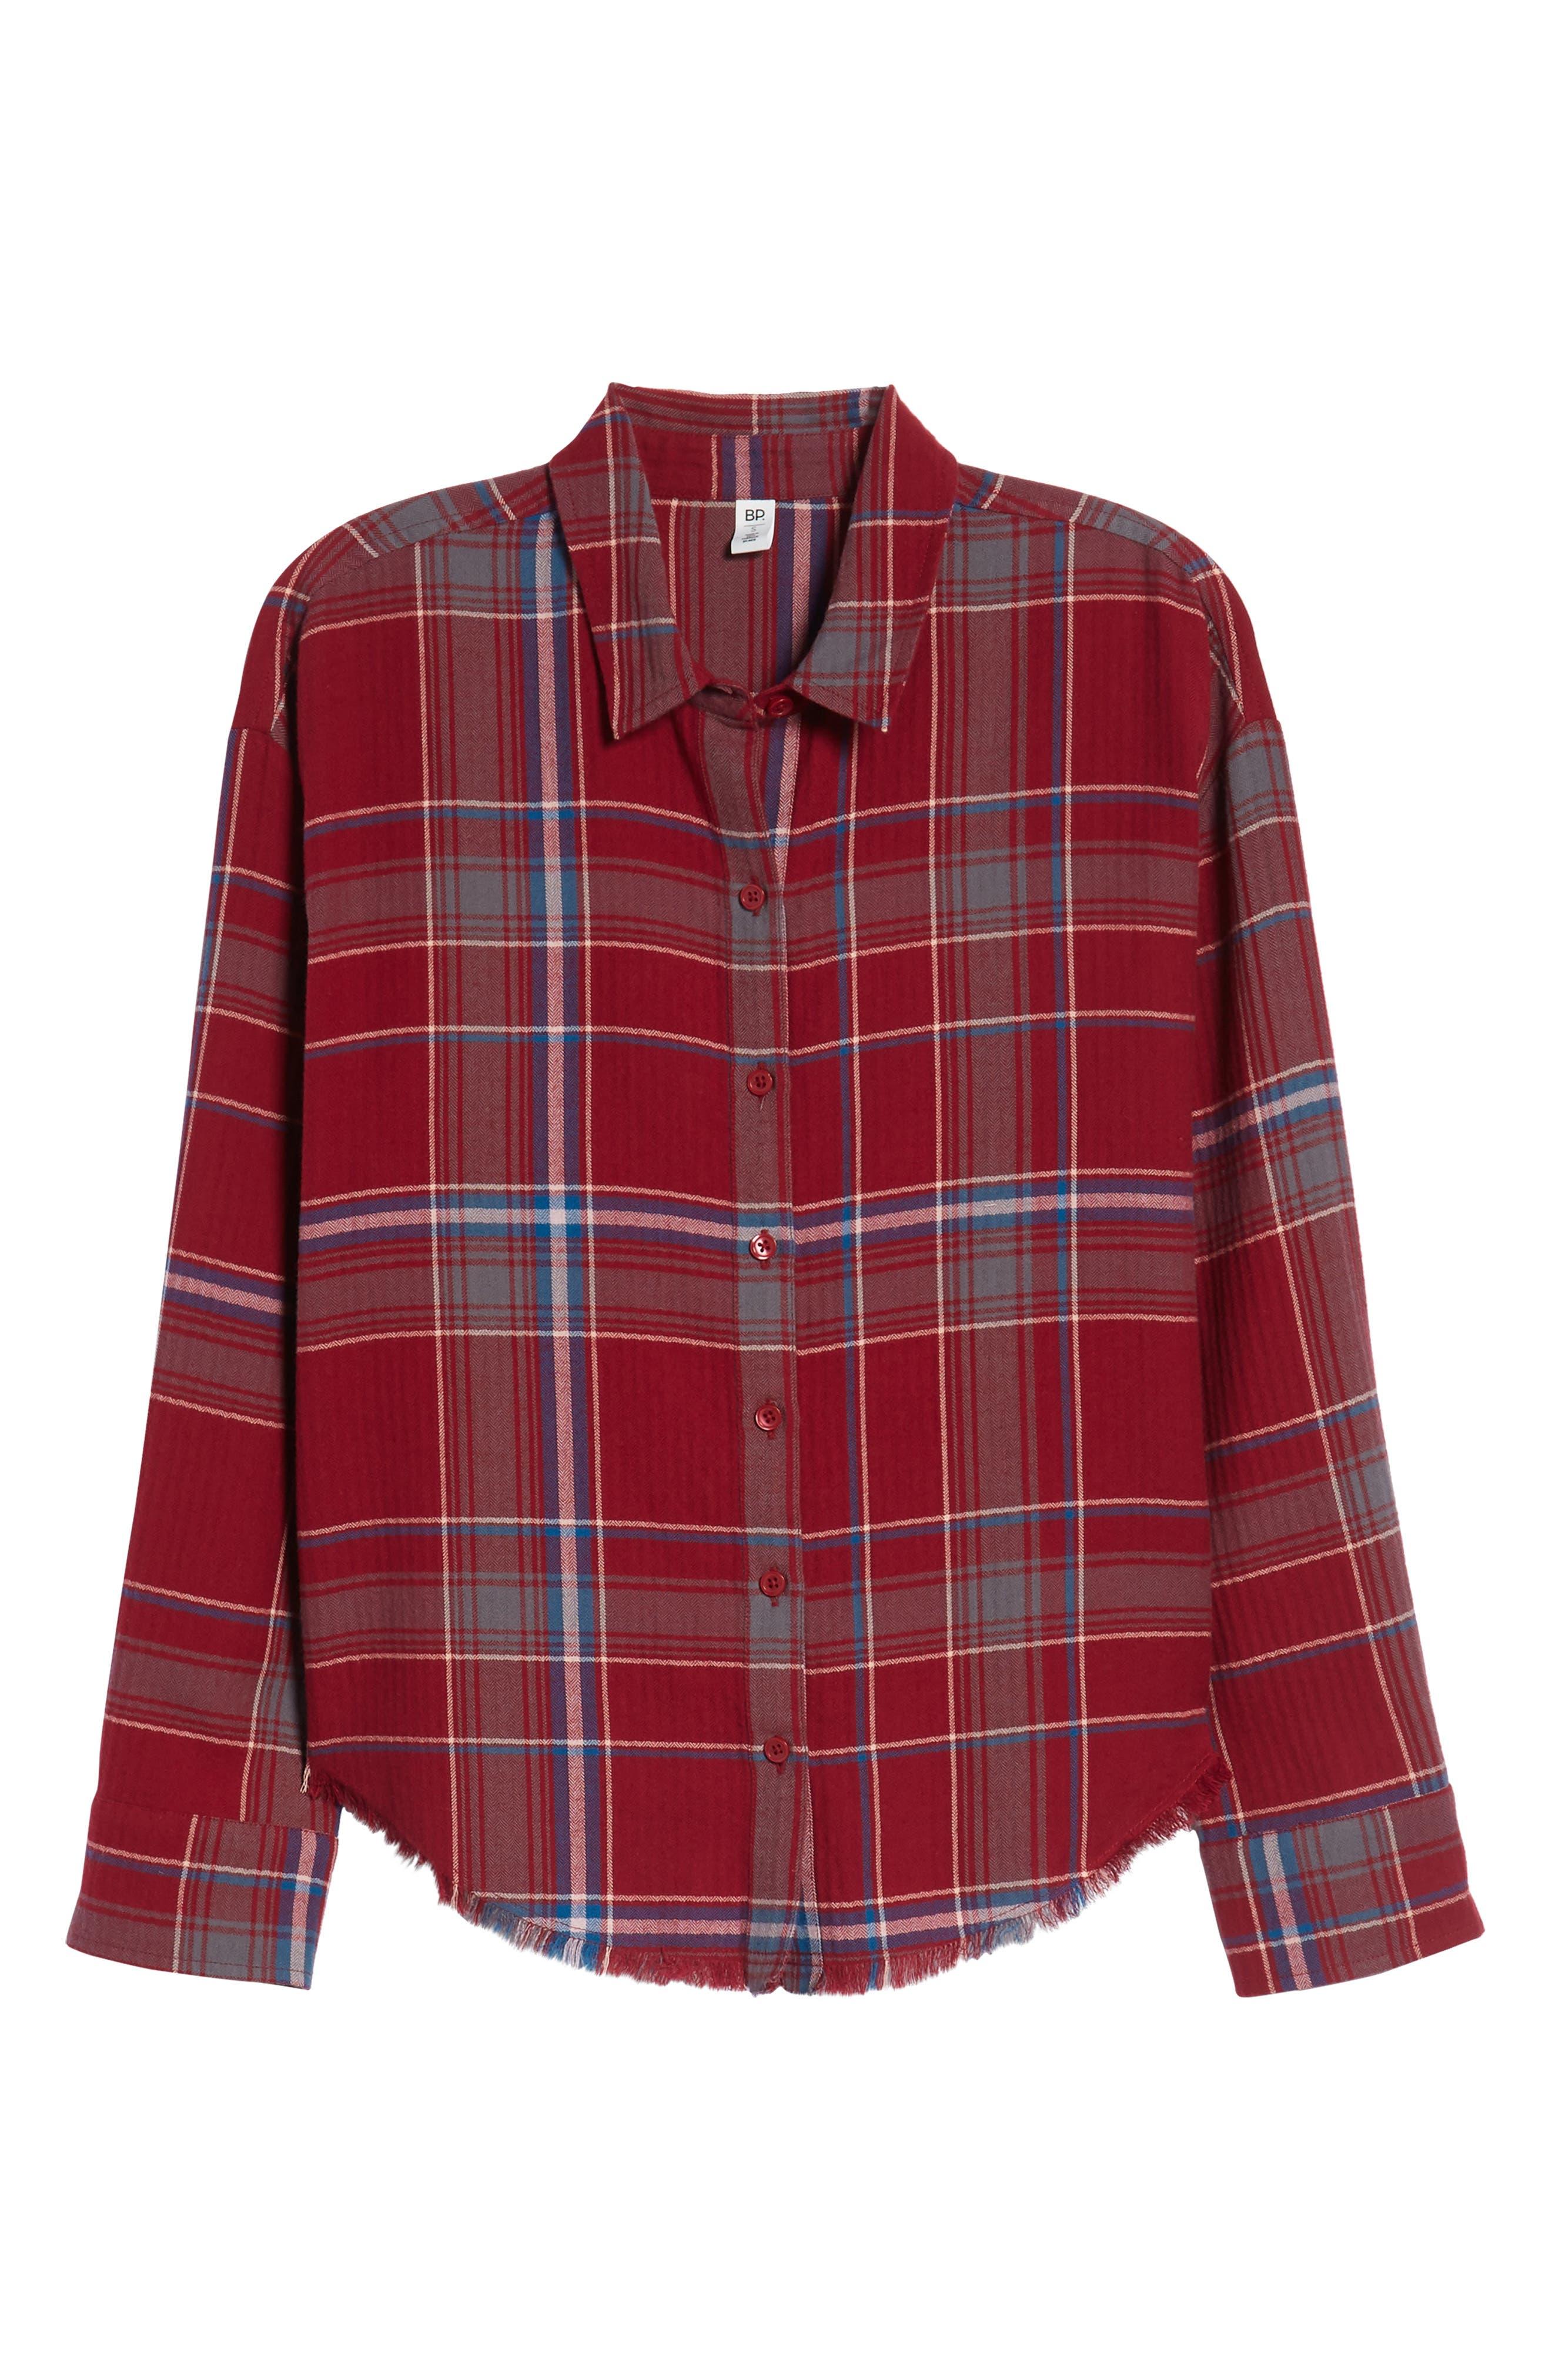 Frayed Edge Plaid Shirt,                             Alternate thumbnail 8, color,                             RED RUMBA NICOLE PLAID